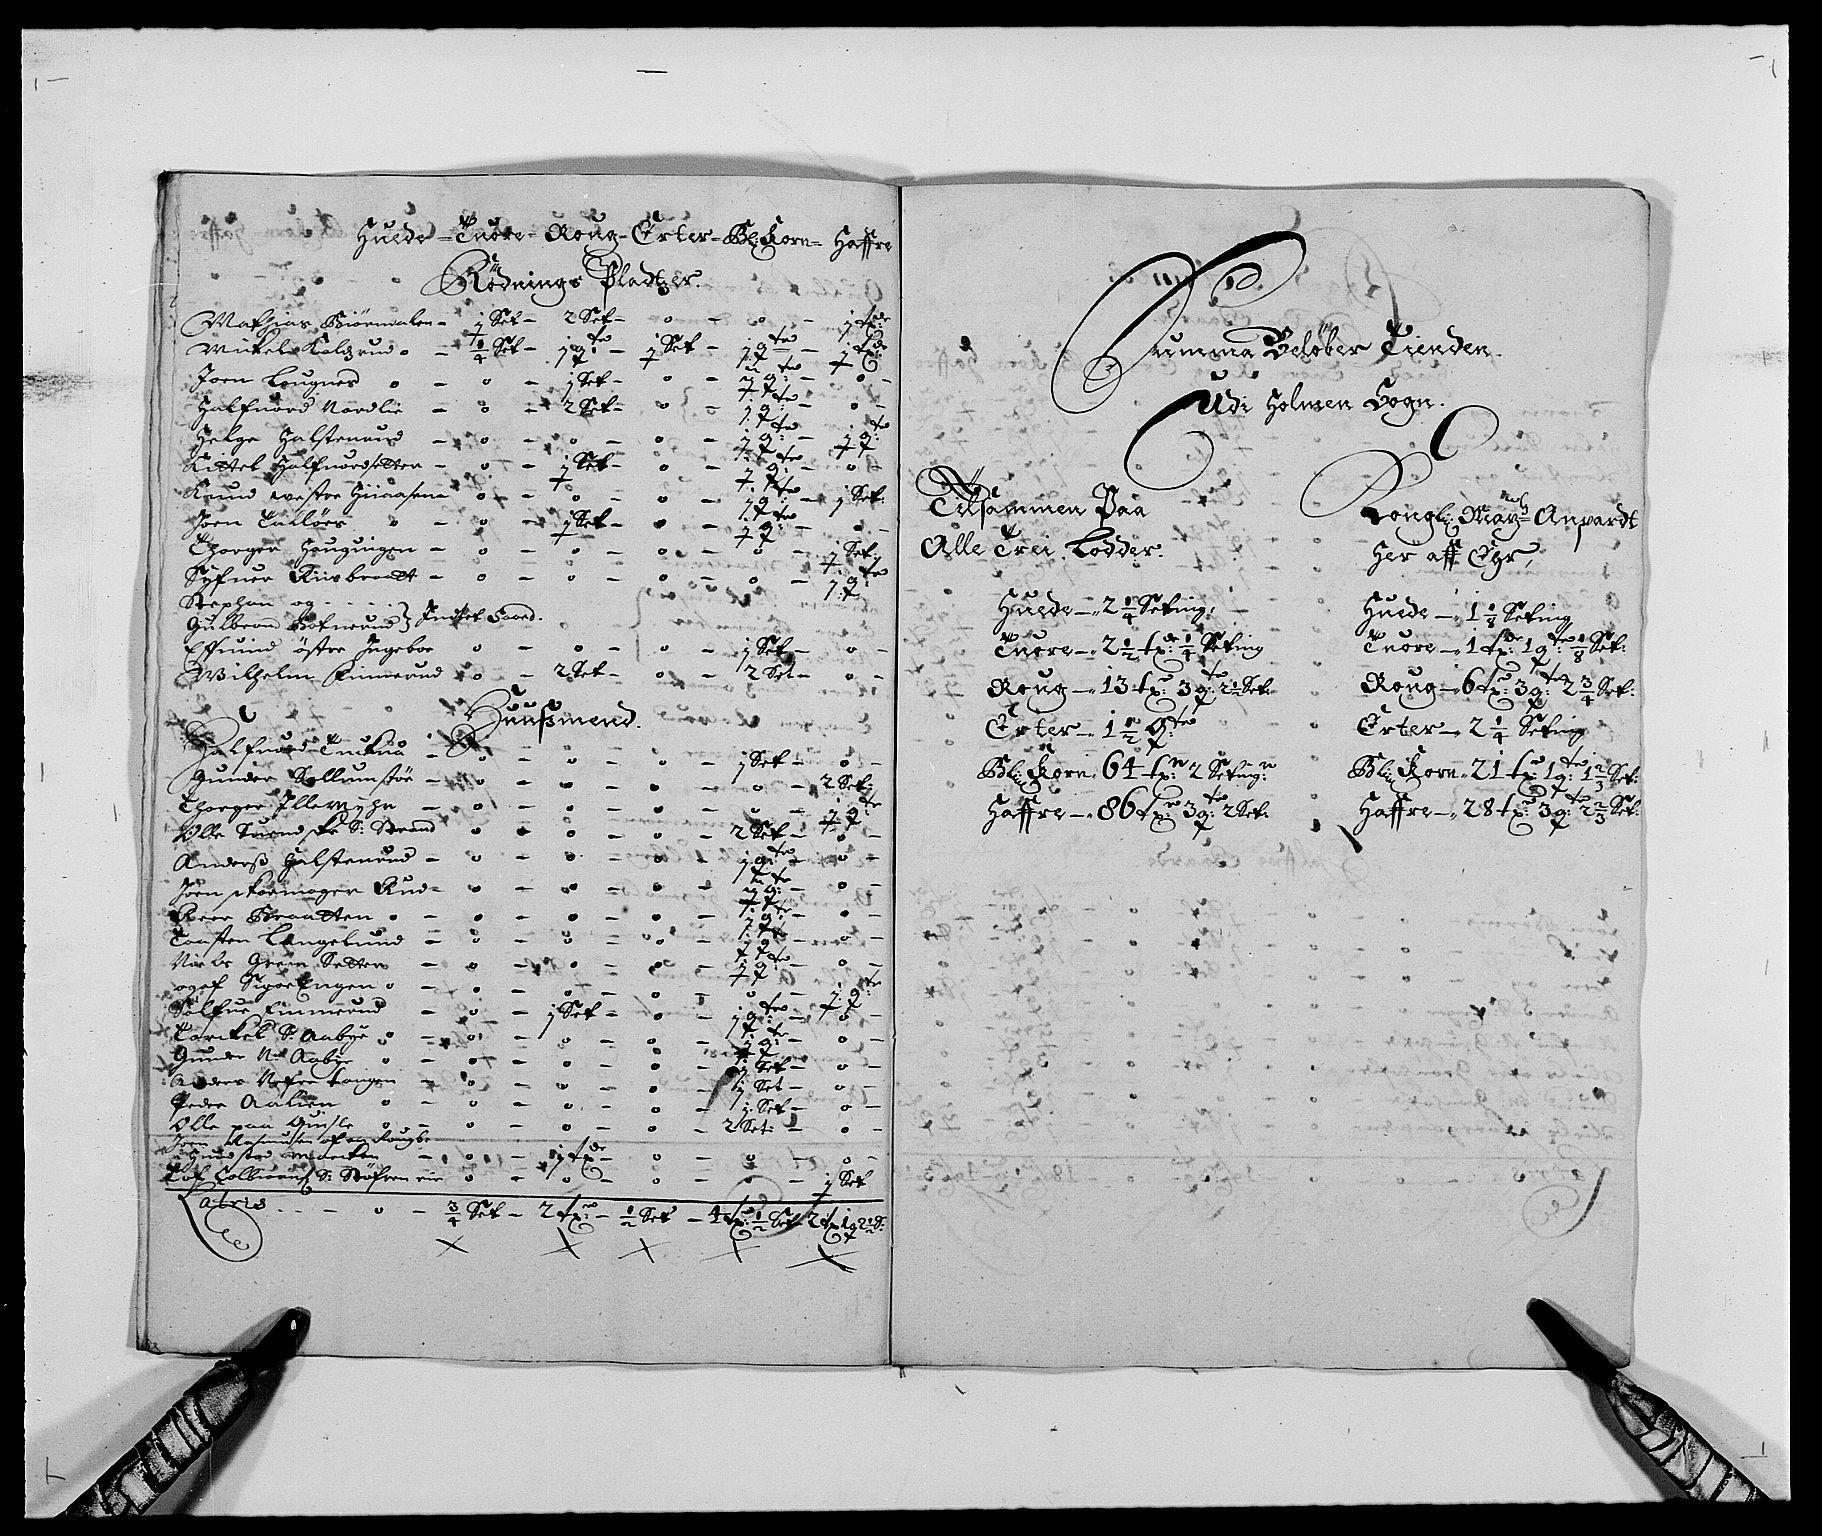 RA, Rentekammeret inntil 1814, Reviderte regnskaper, Fogderegnskap, R25/L1679: Fogderegnskap Buskerud, 1687-1688, s. 59